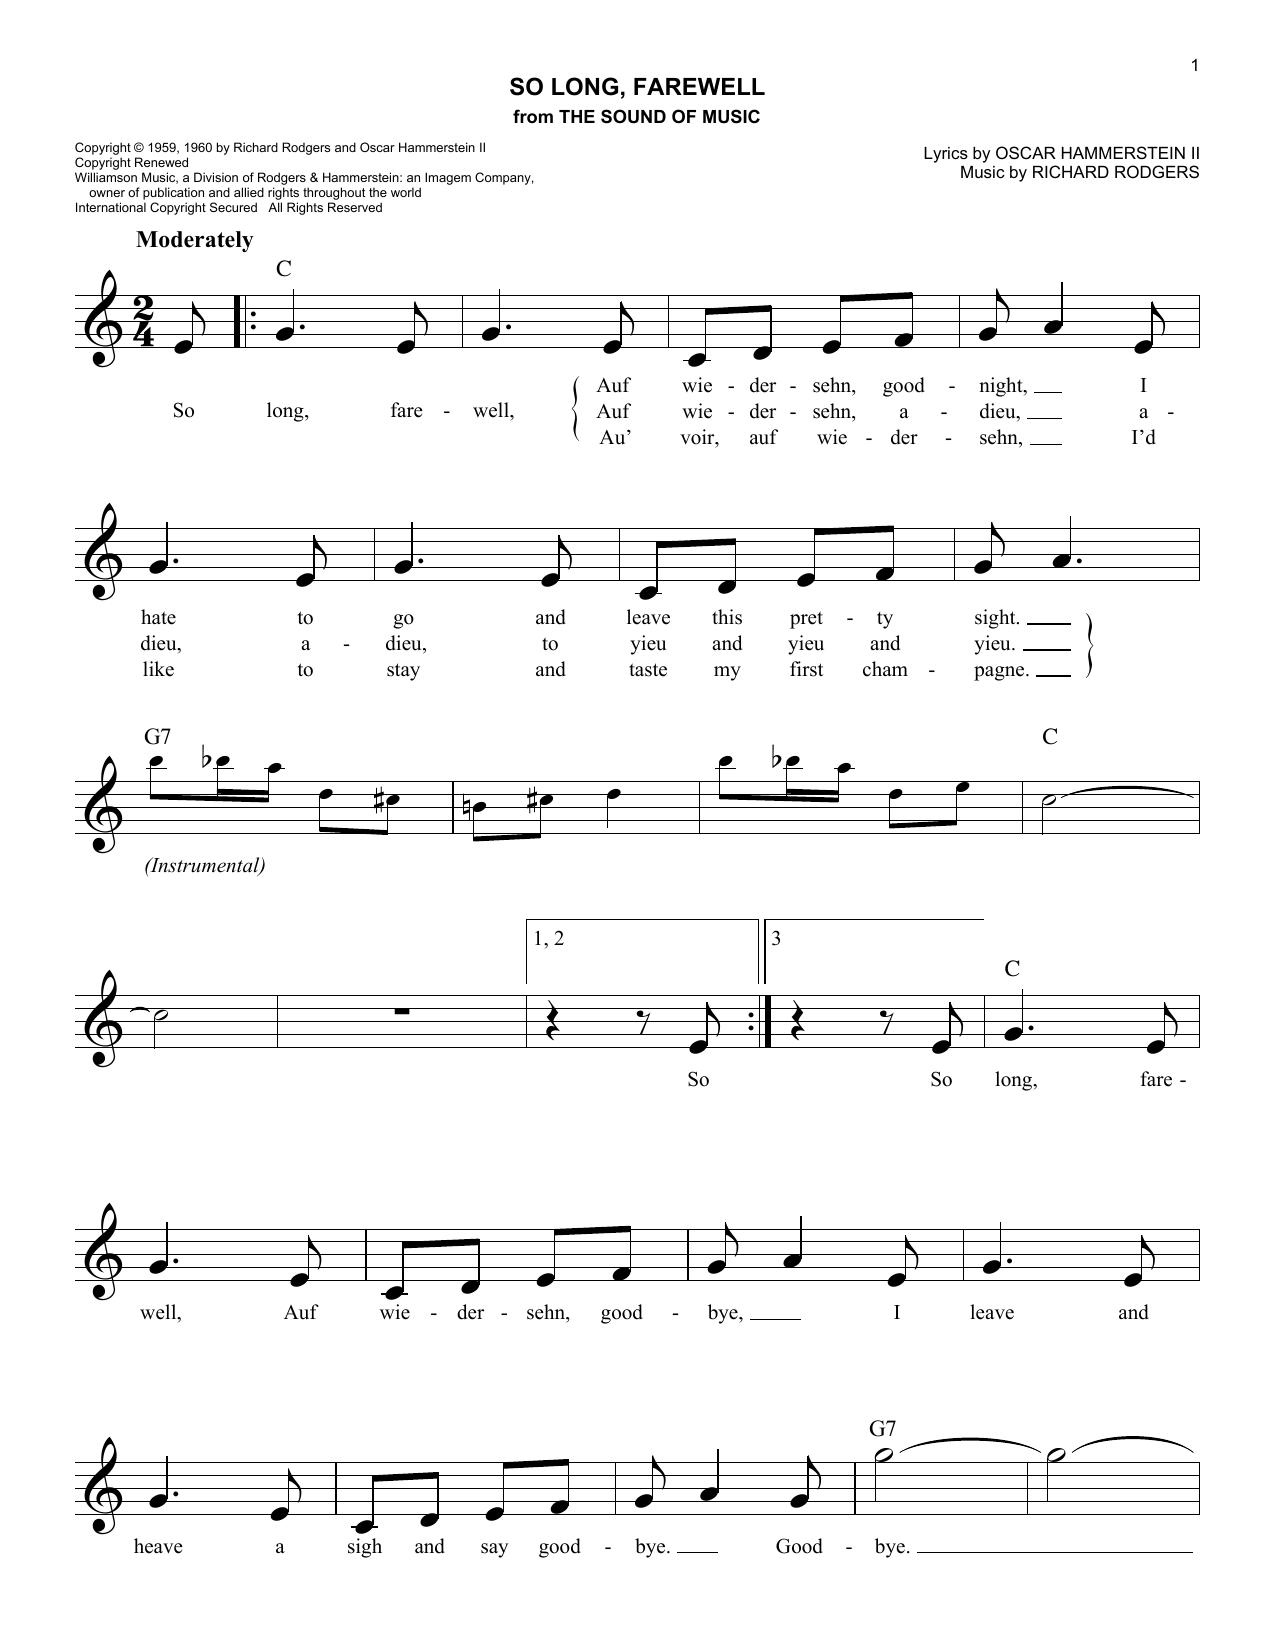 So Long, Farewell Sheet Music